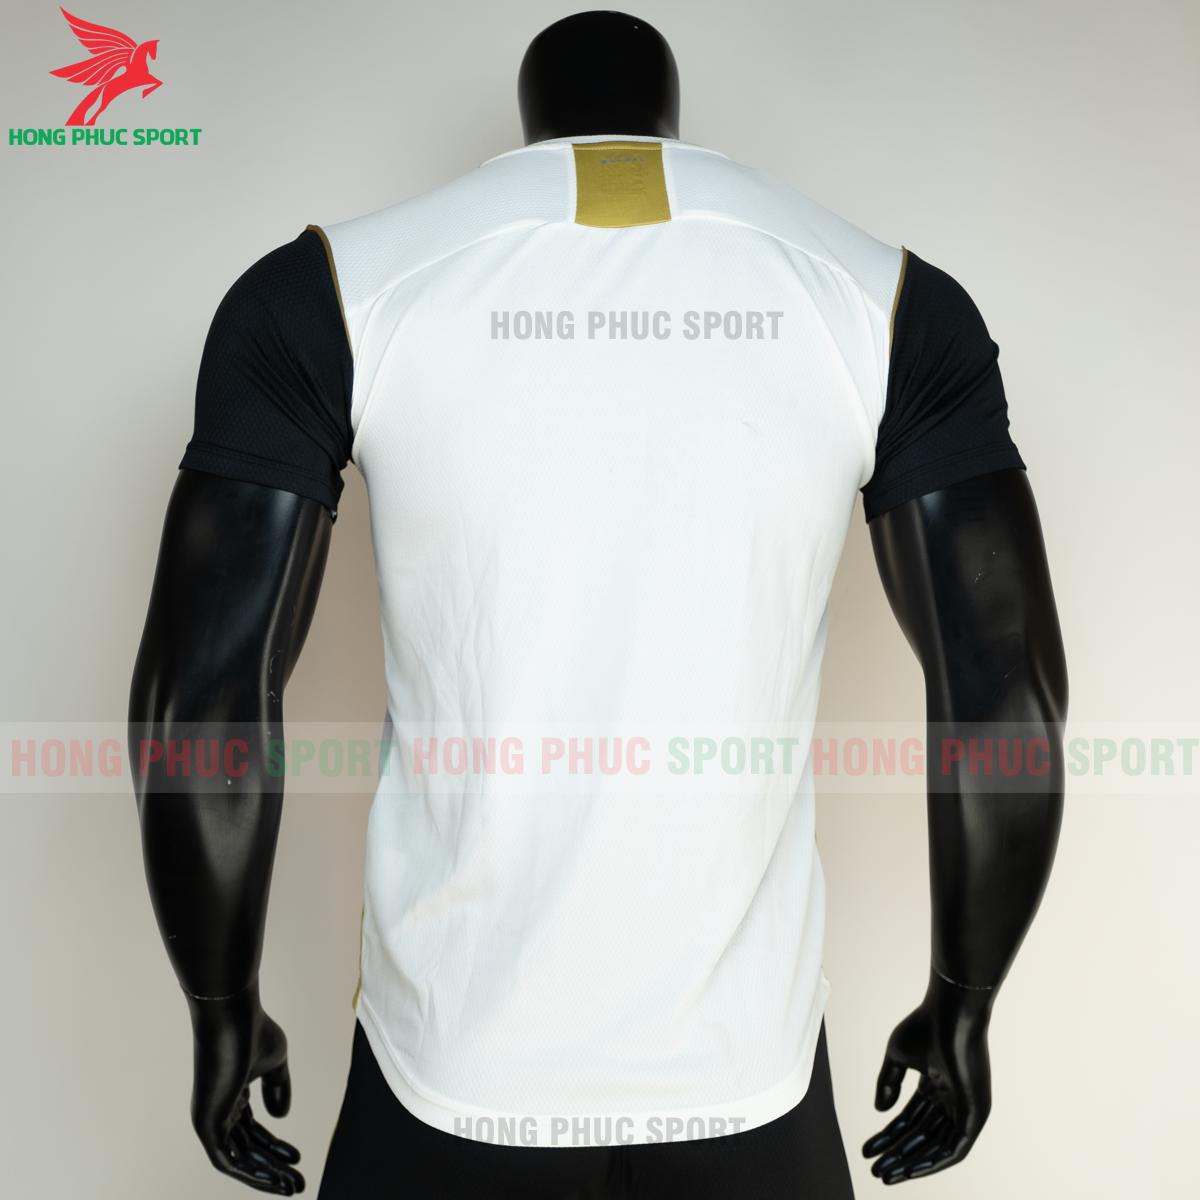 https://cdn.hongphucsport.com/unsafe/s4.shopbay.vn/files/285/ao-bong-da-khong-logo-bulbal-hades-mau-trang-7-604f30de998cb.png